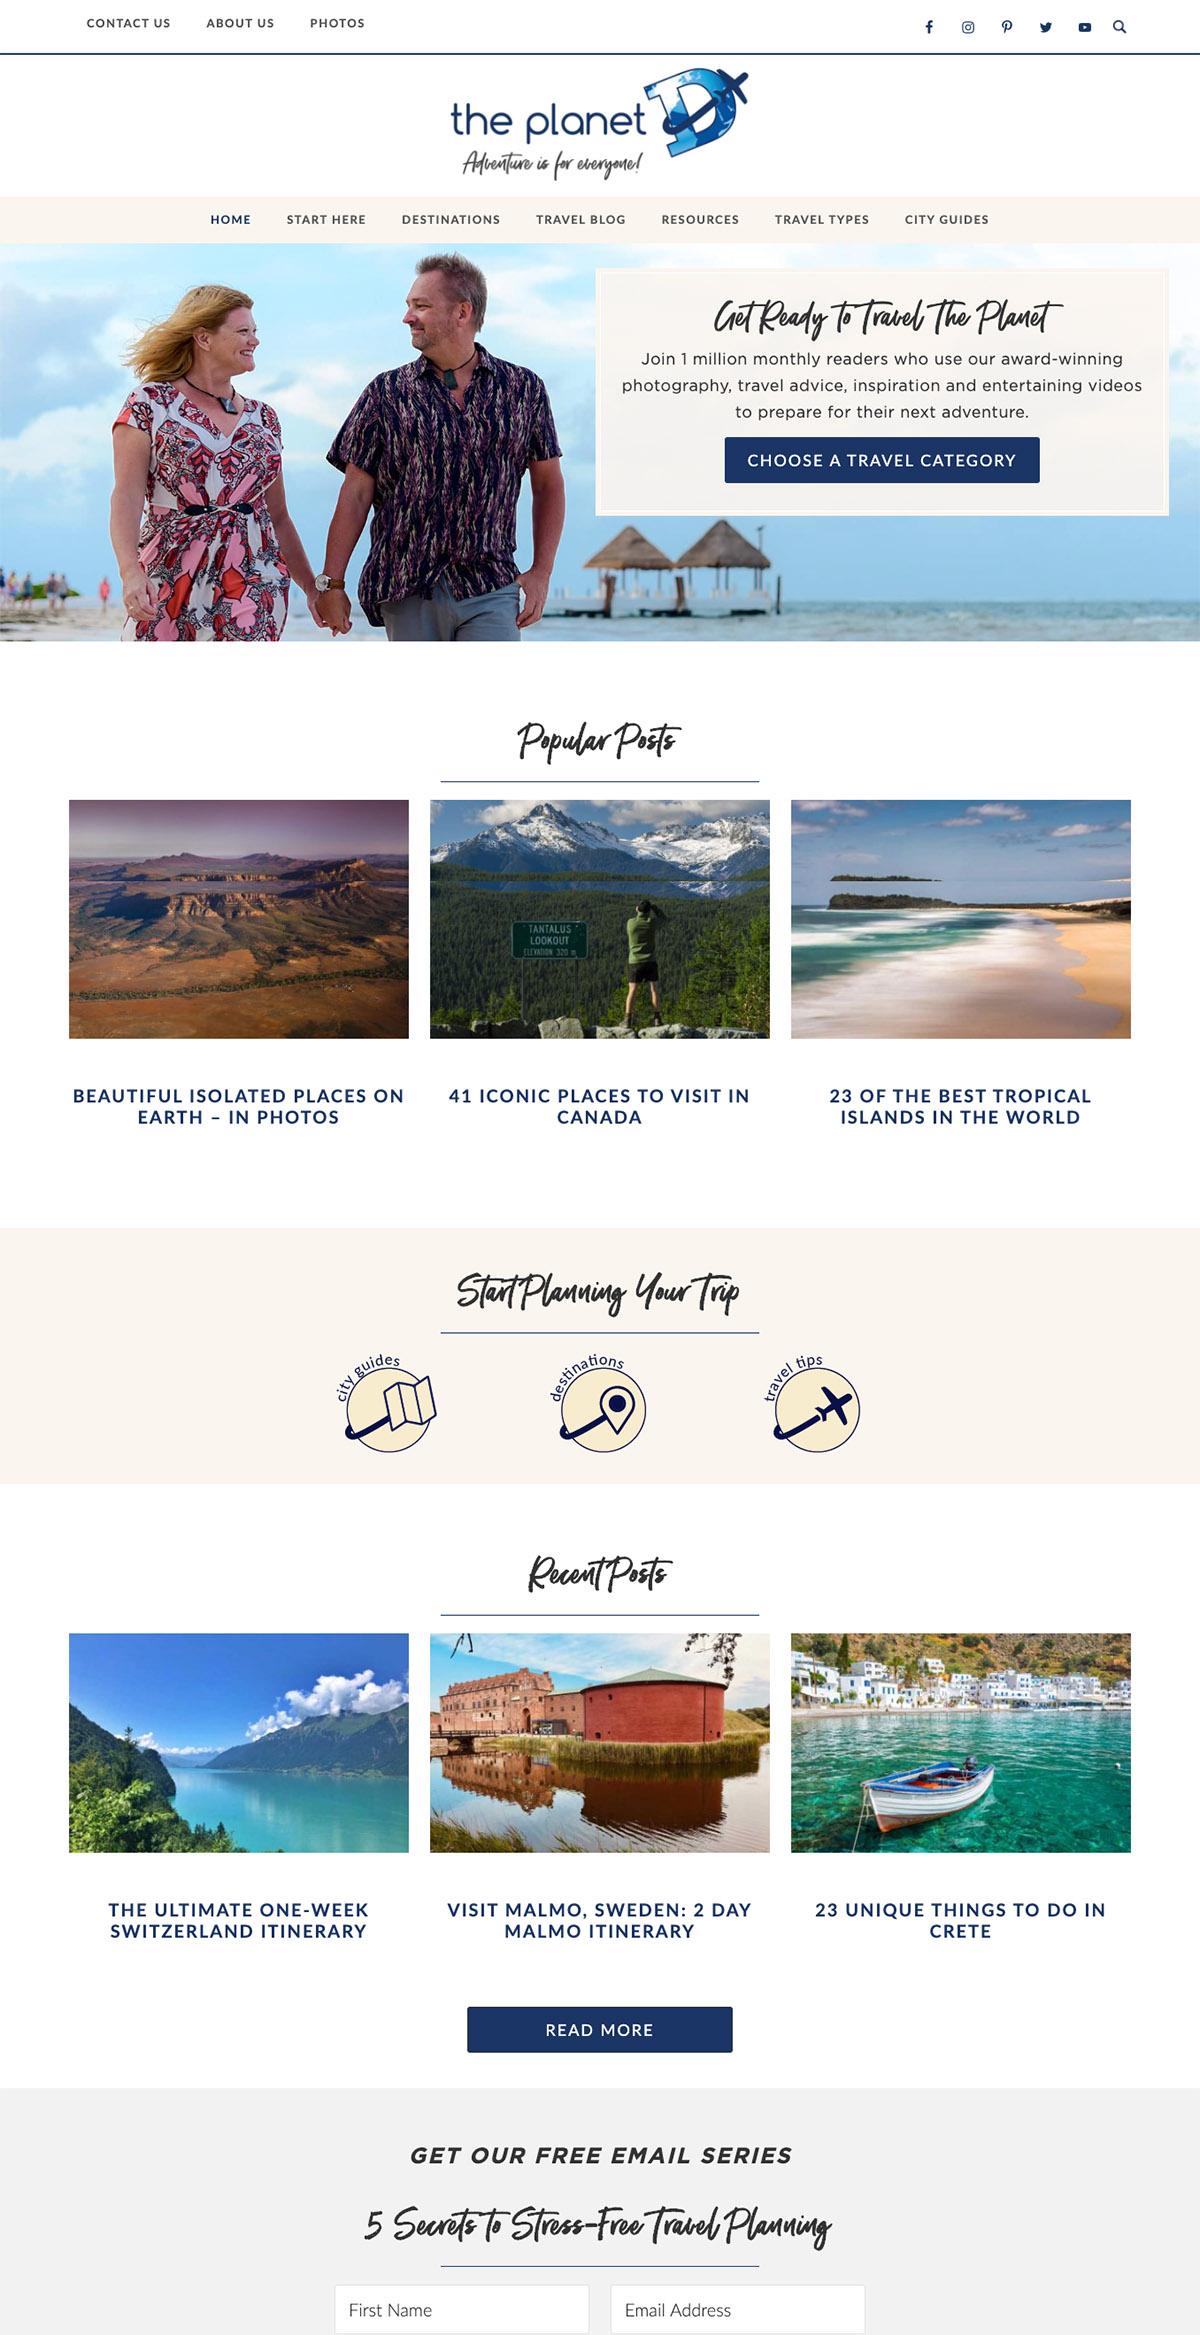 theplanetd-travel-blog-web-design